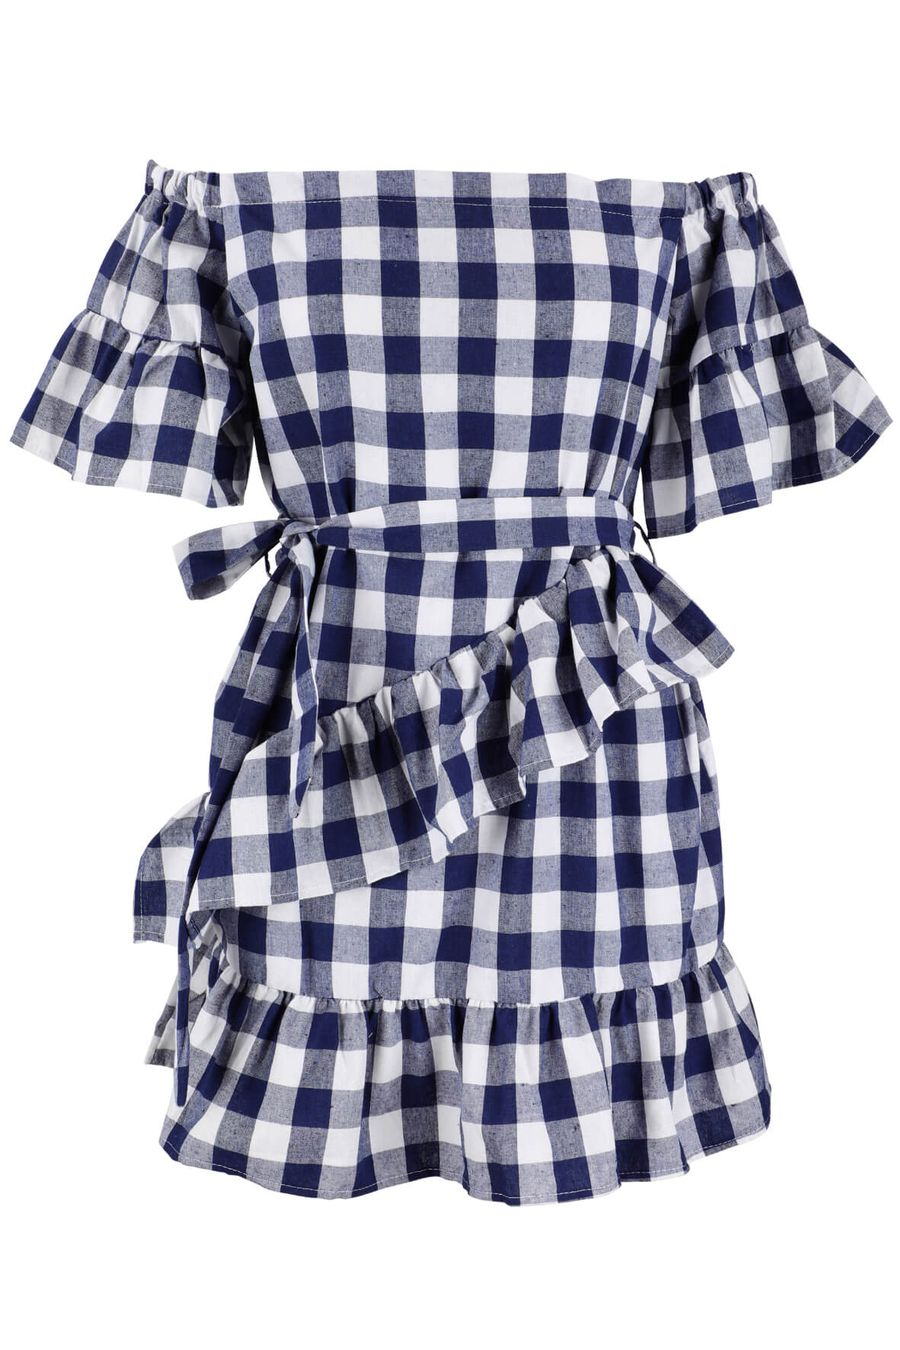 haute-rouge-checkmate-off-shoulder-dress-1 (1)